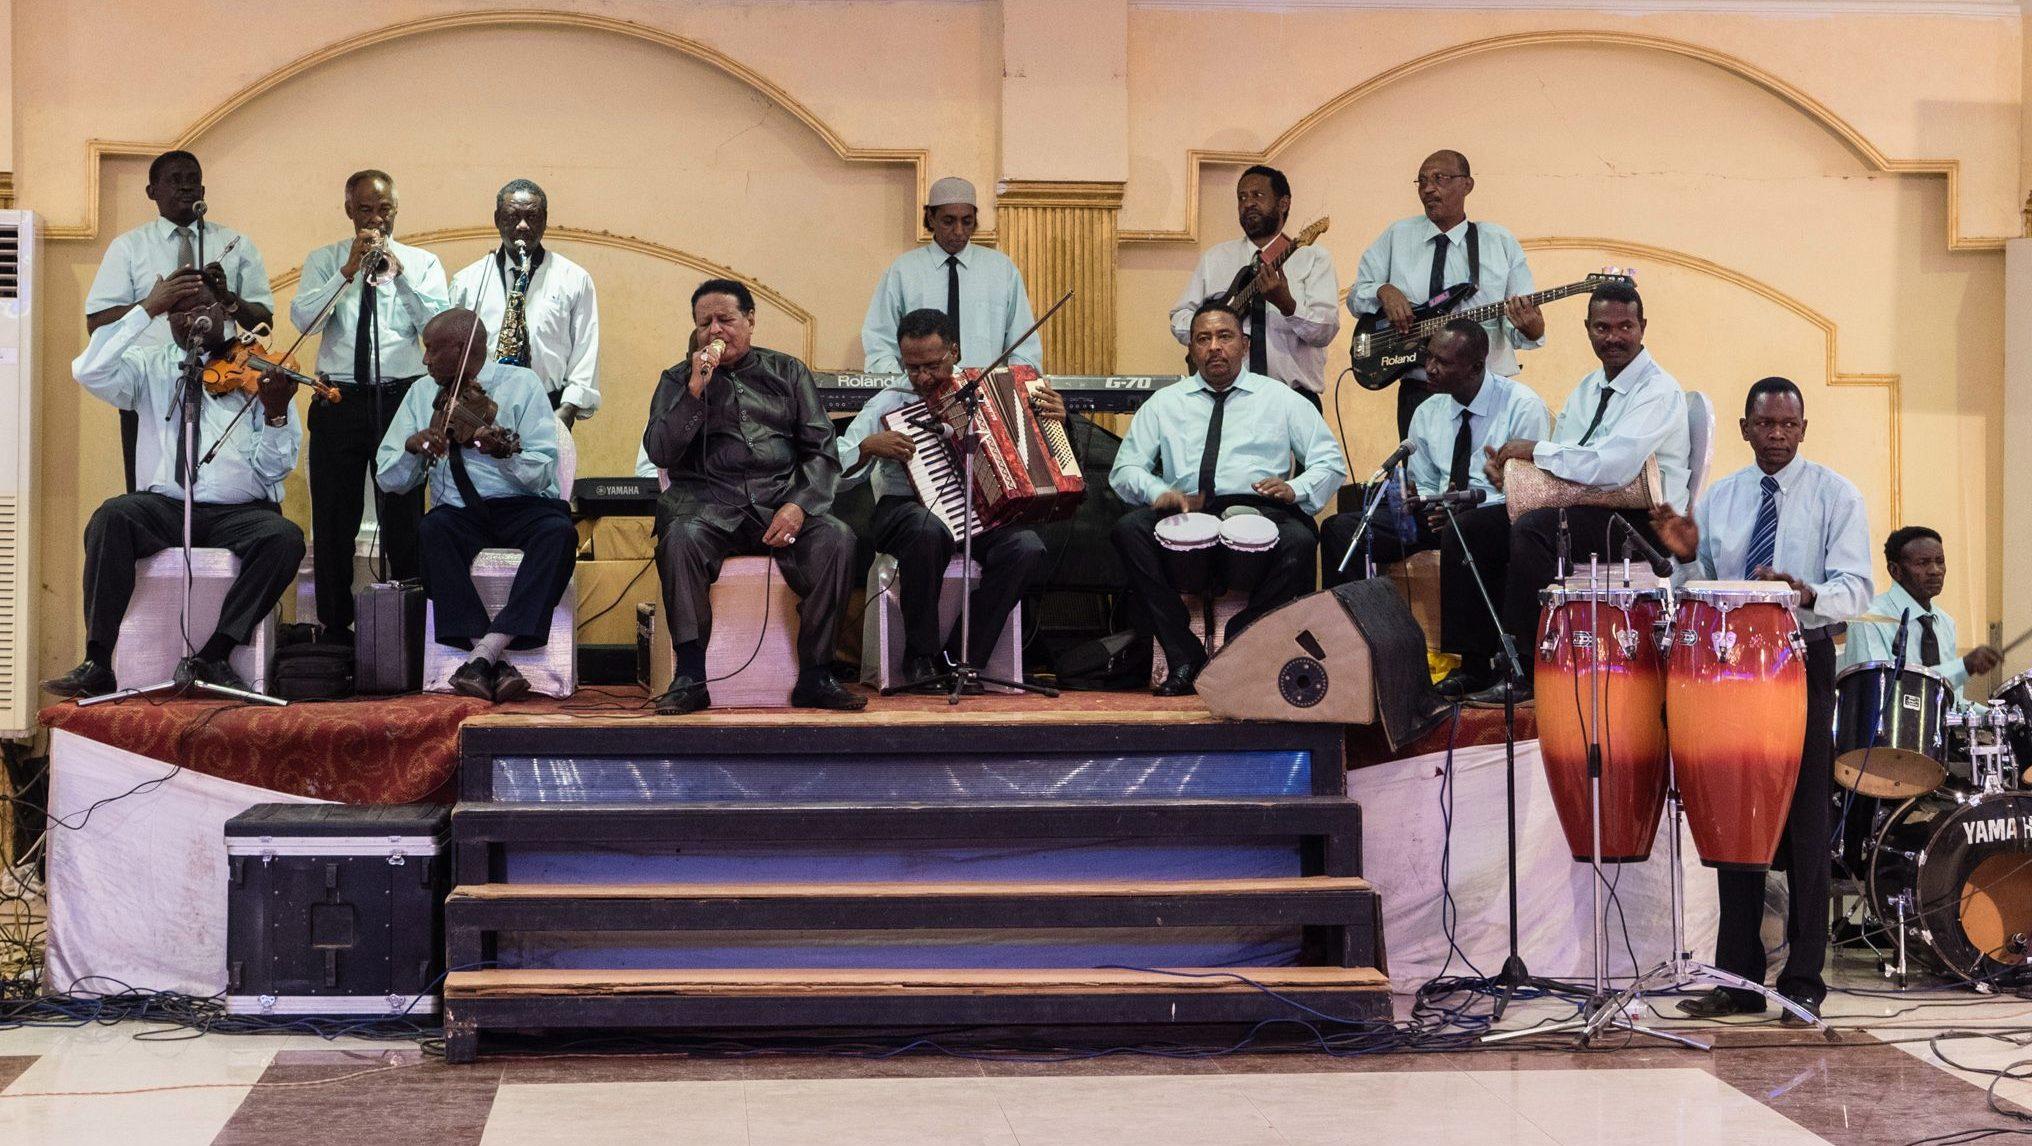 Legendary singer Salah Ben Al Badia (center in black) sings at a wedding in Omdurman, Sudan.